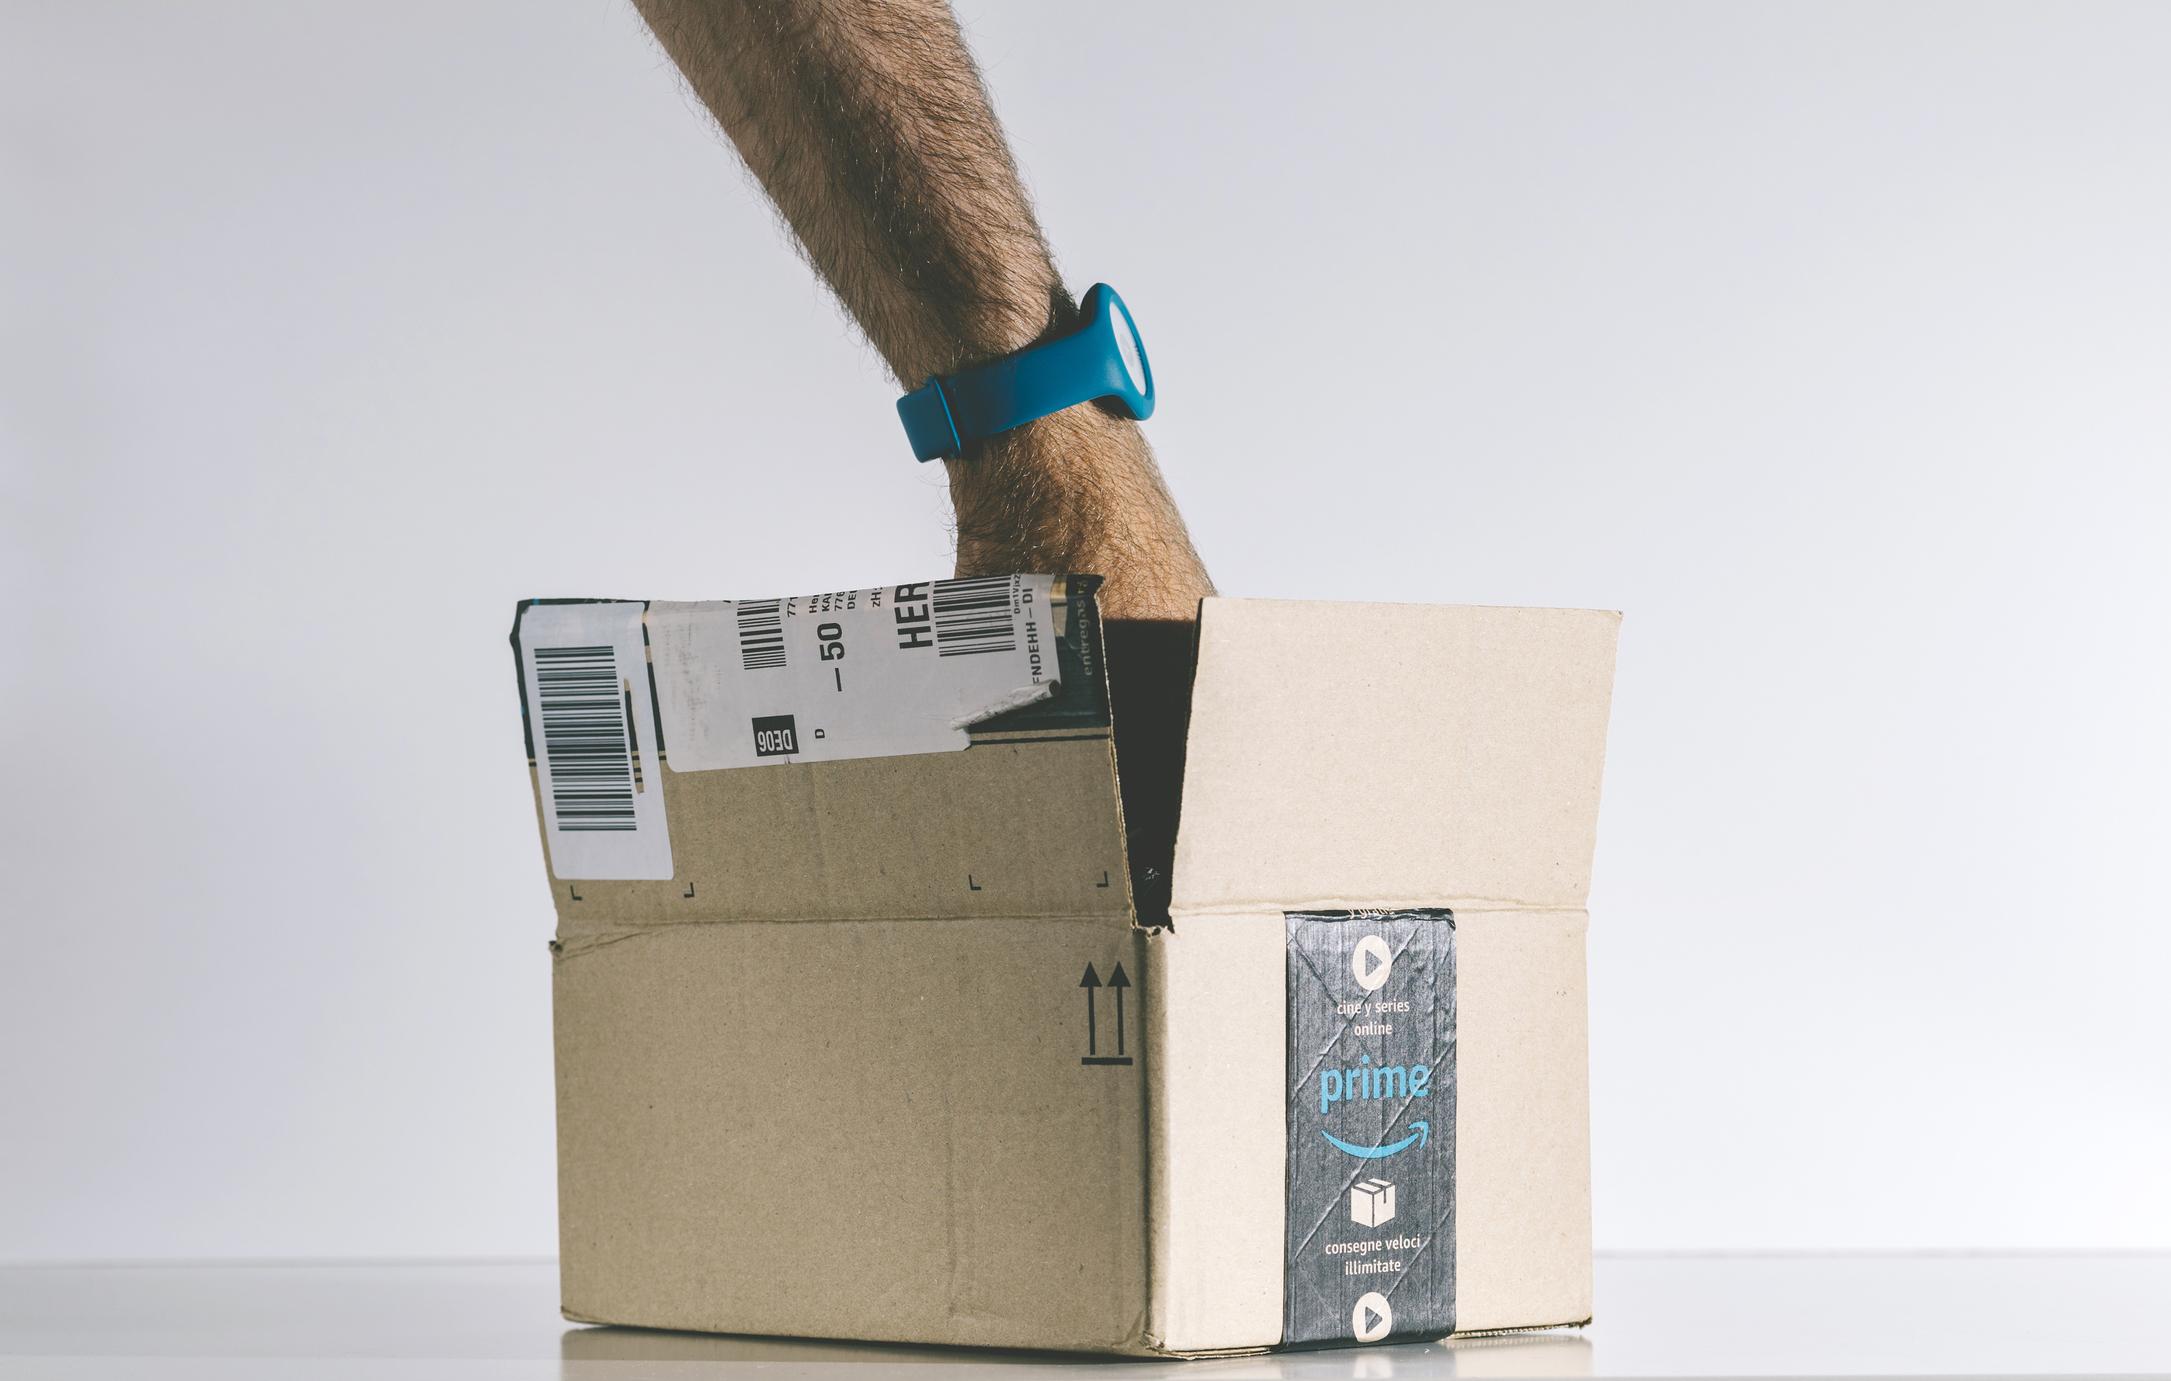 Hand inside of an open Amazon box